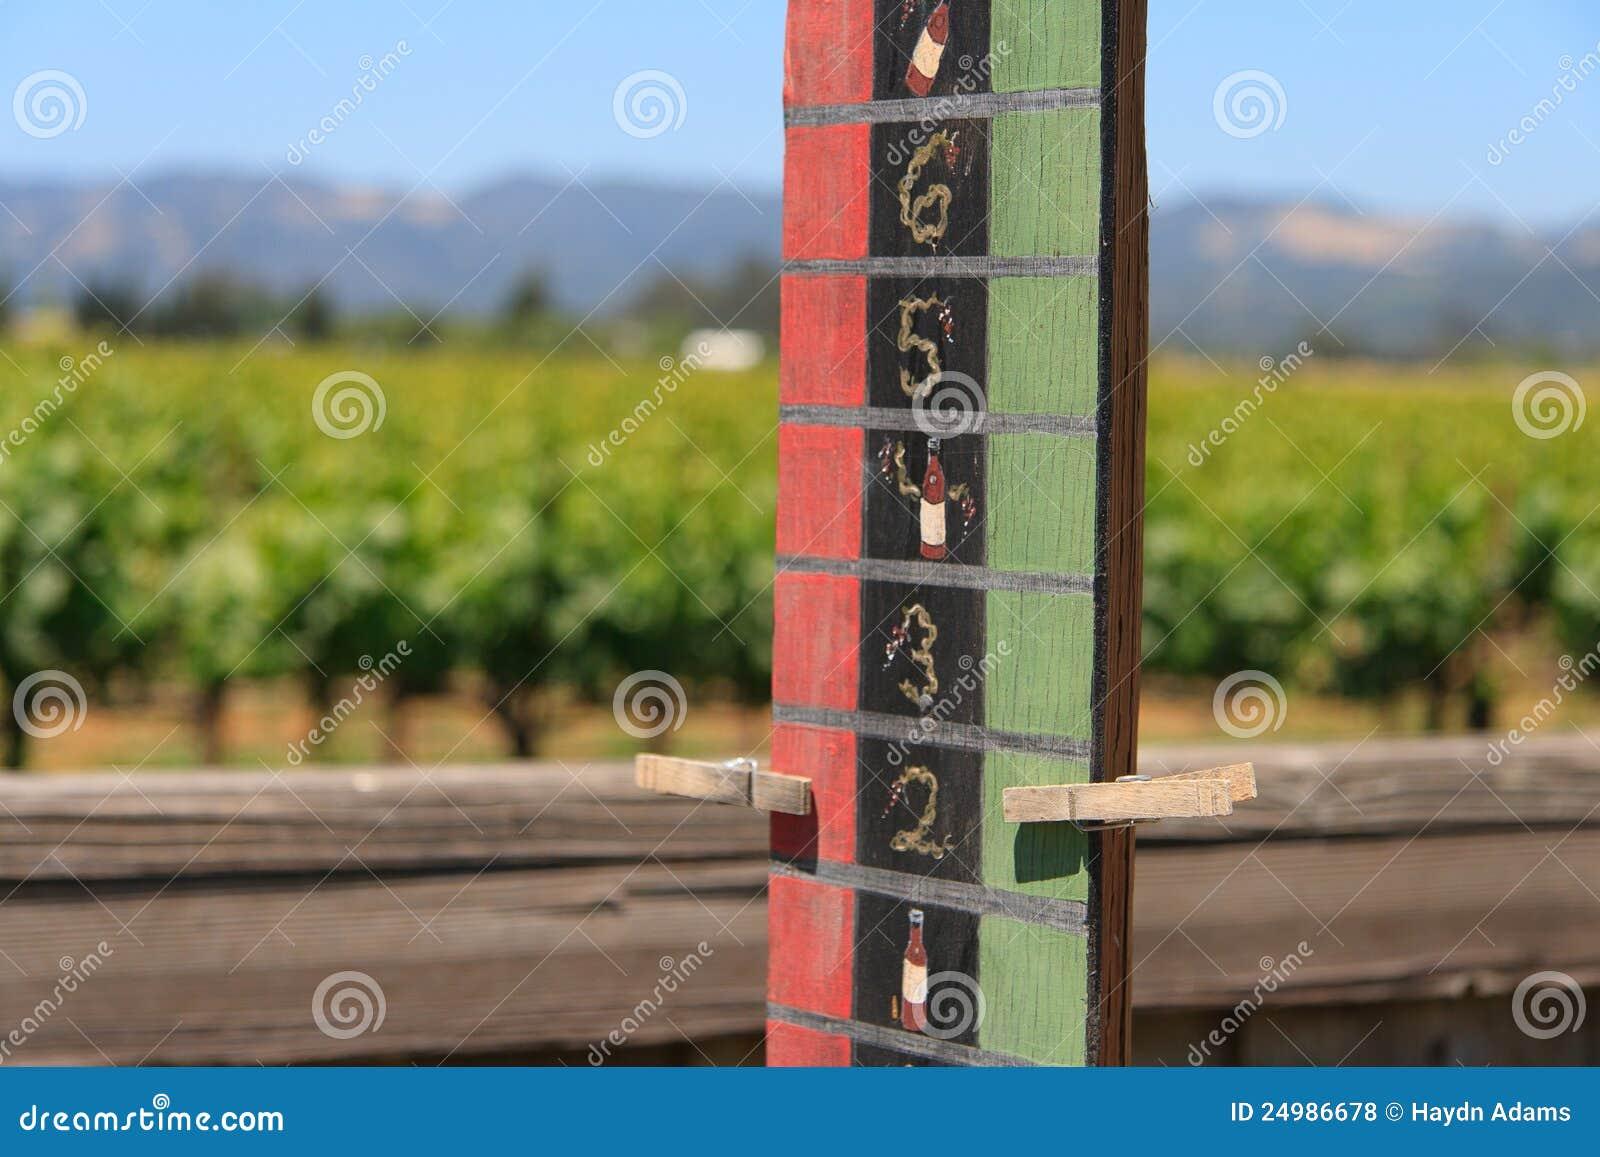 Wine Country Bocce Ball Scoreboard Score Tied Royalty